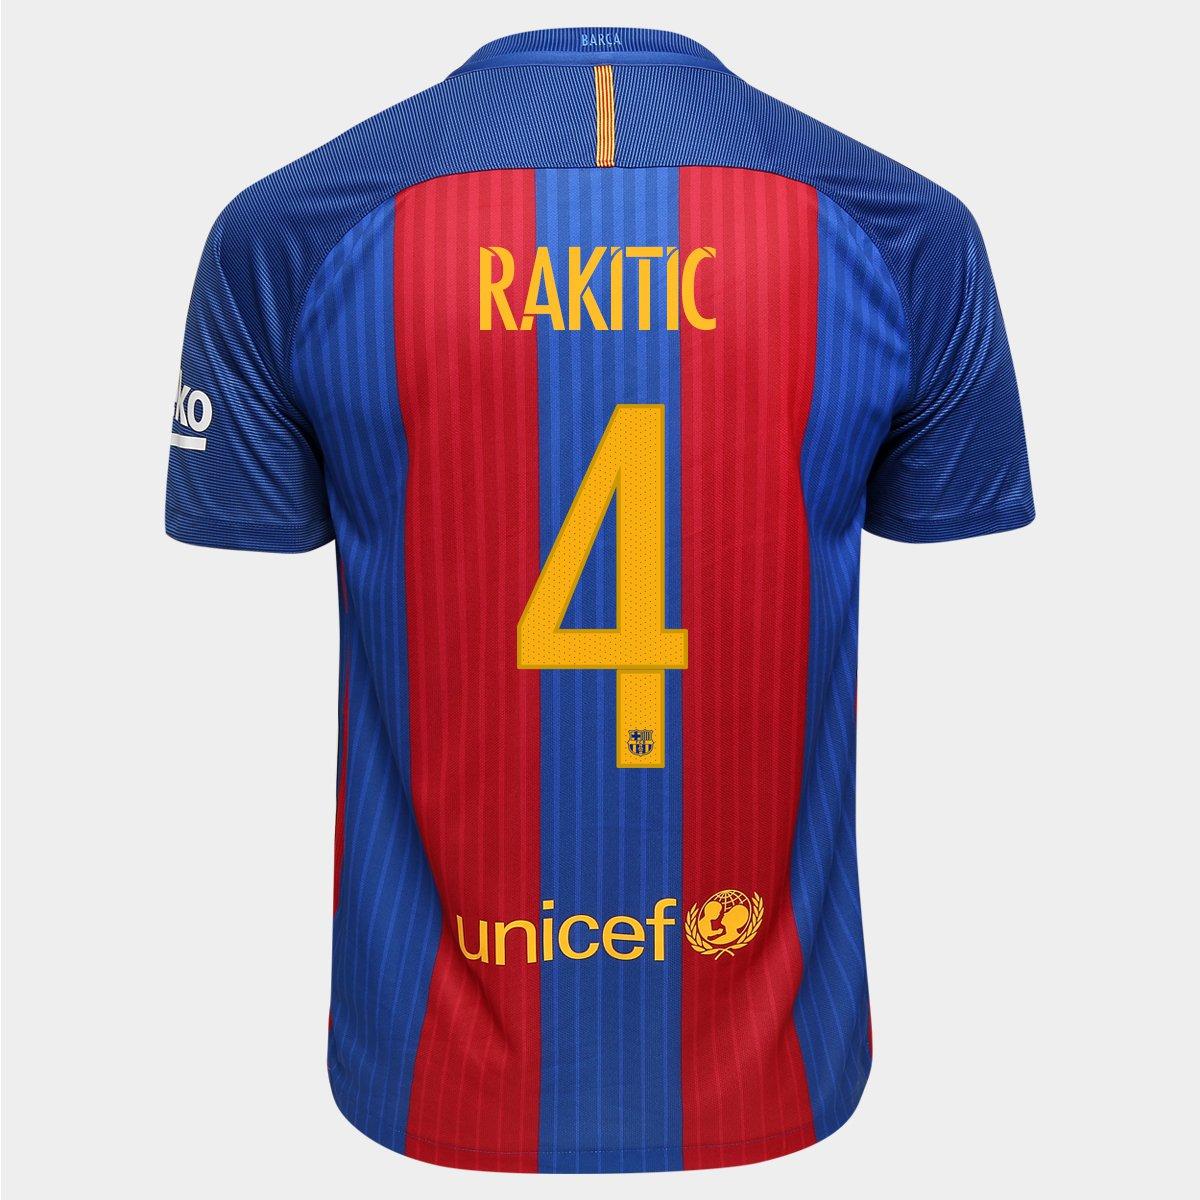 Camisa Nike Barcelona Home 16 17 Nº 4 - Rakitić - Compre Agora ... e793394f50135